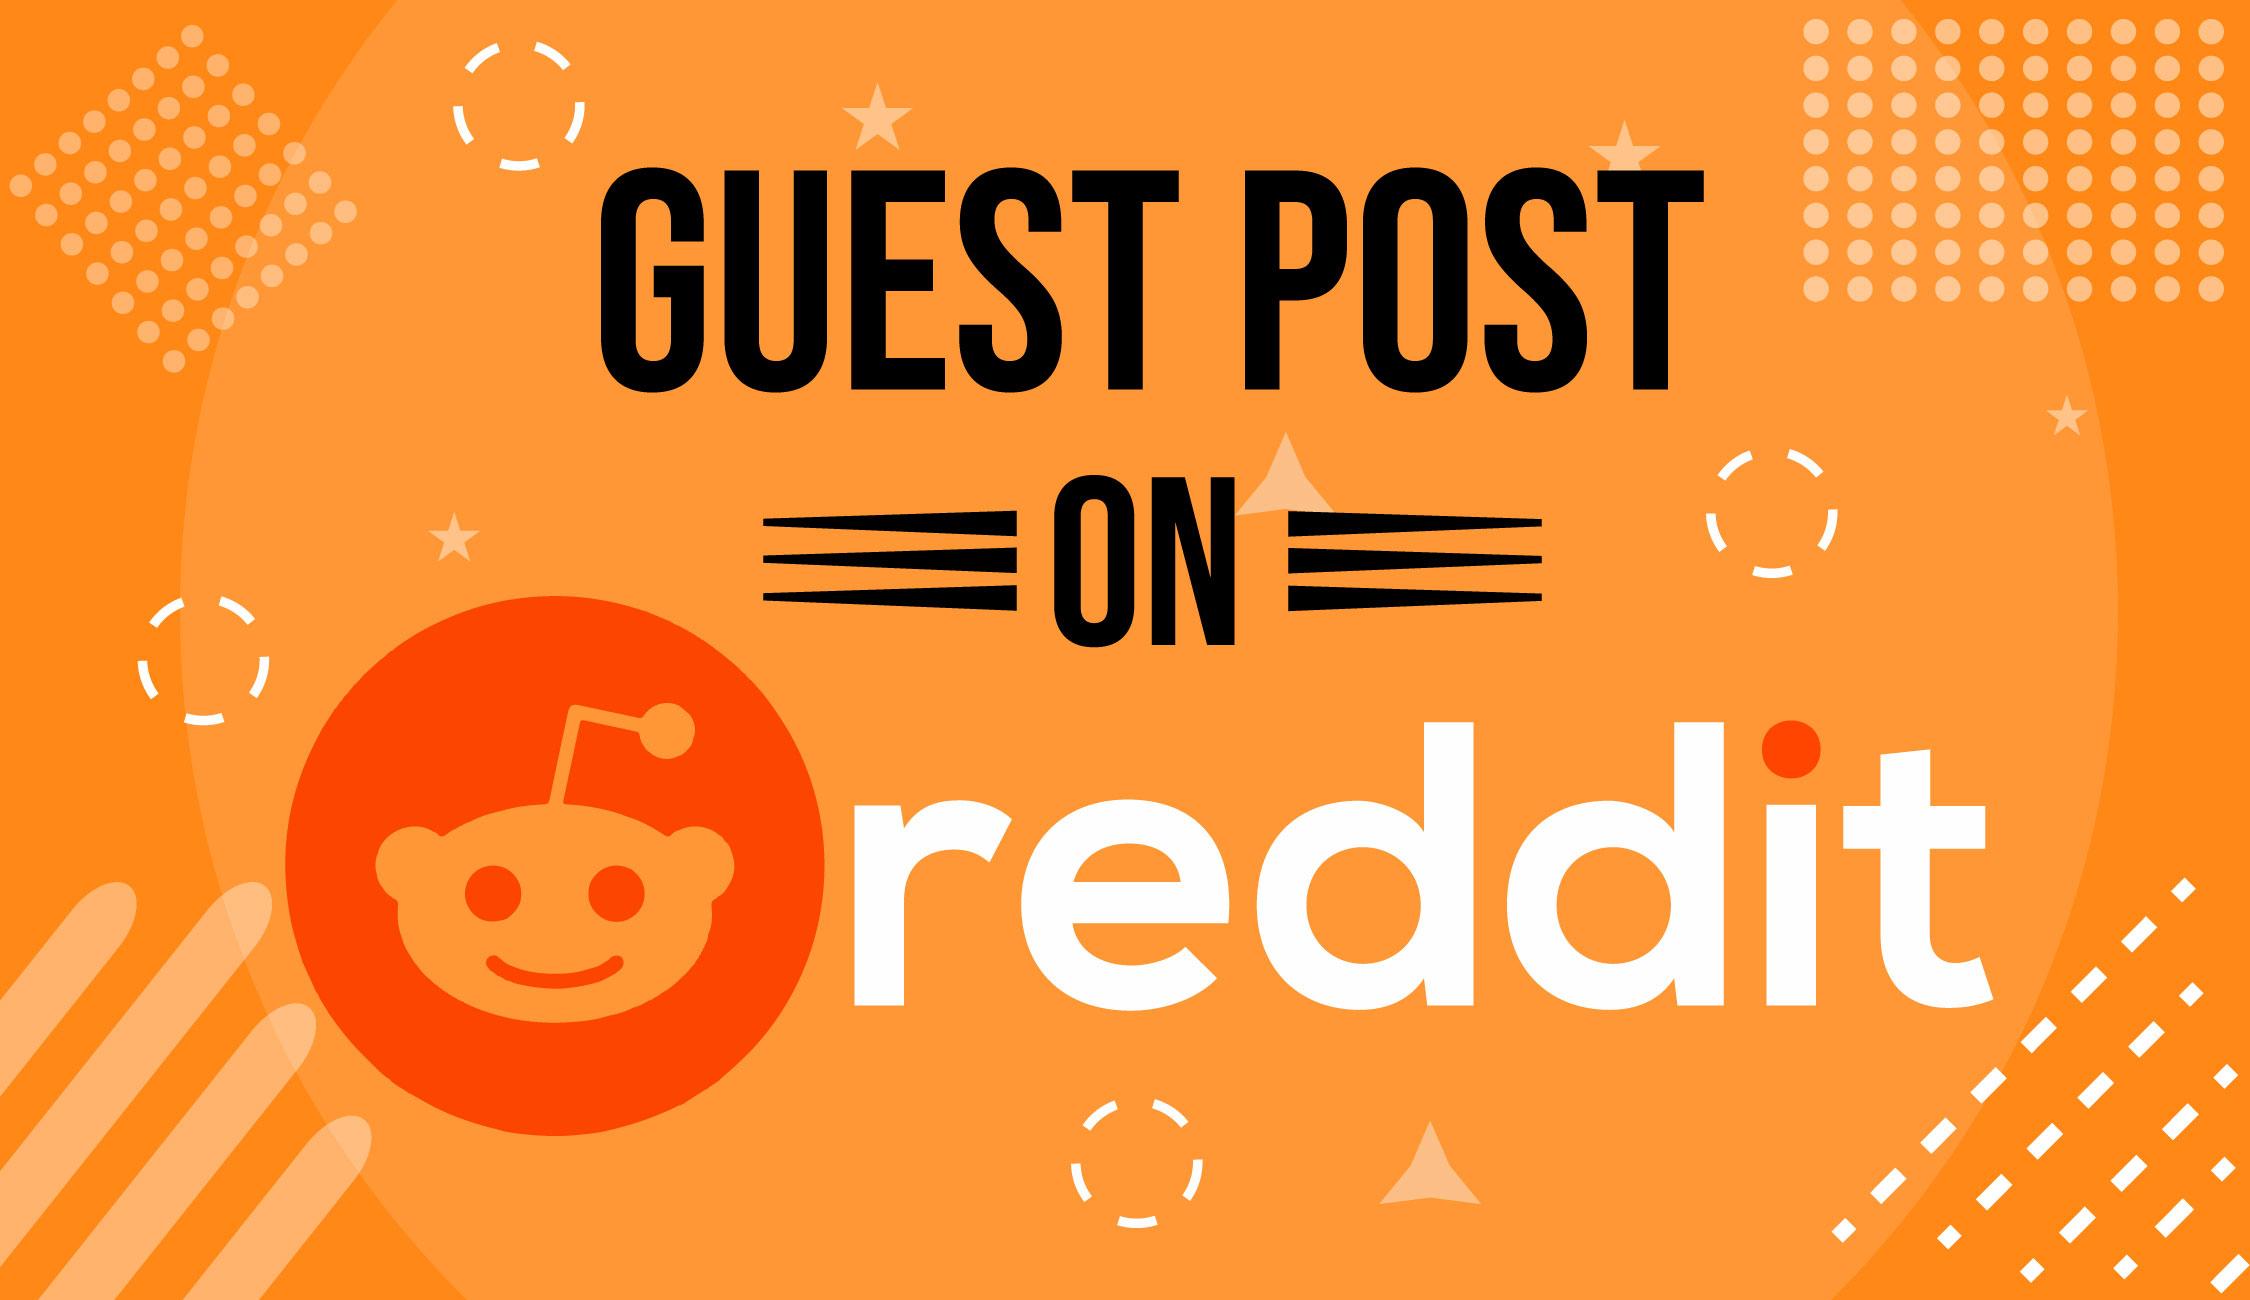 Promote your website by publishing 5HQ Guest Blog Post on reddit.com